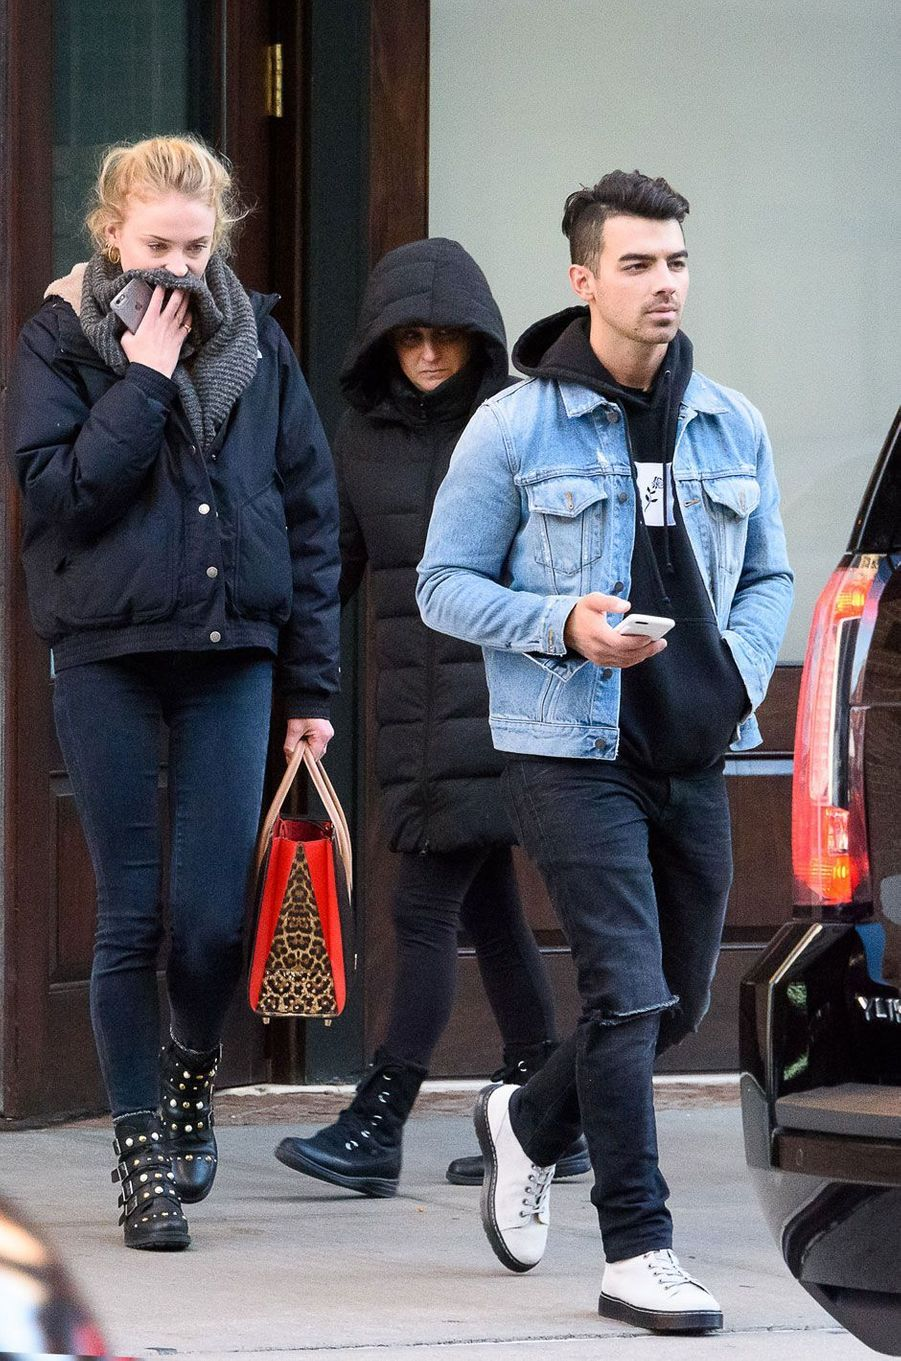 Sophie Turner et Joe Jonas sont en couple depuis plusieurs semaines